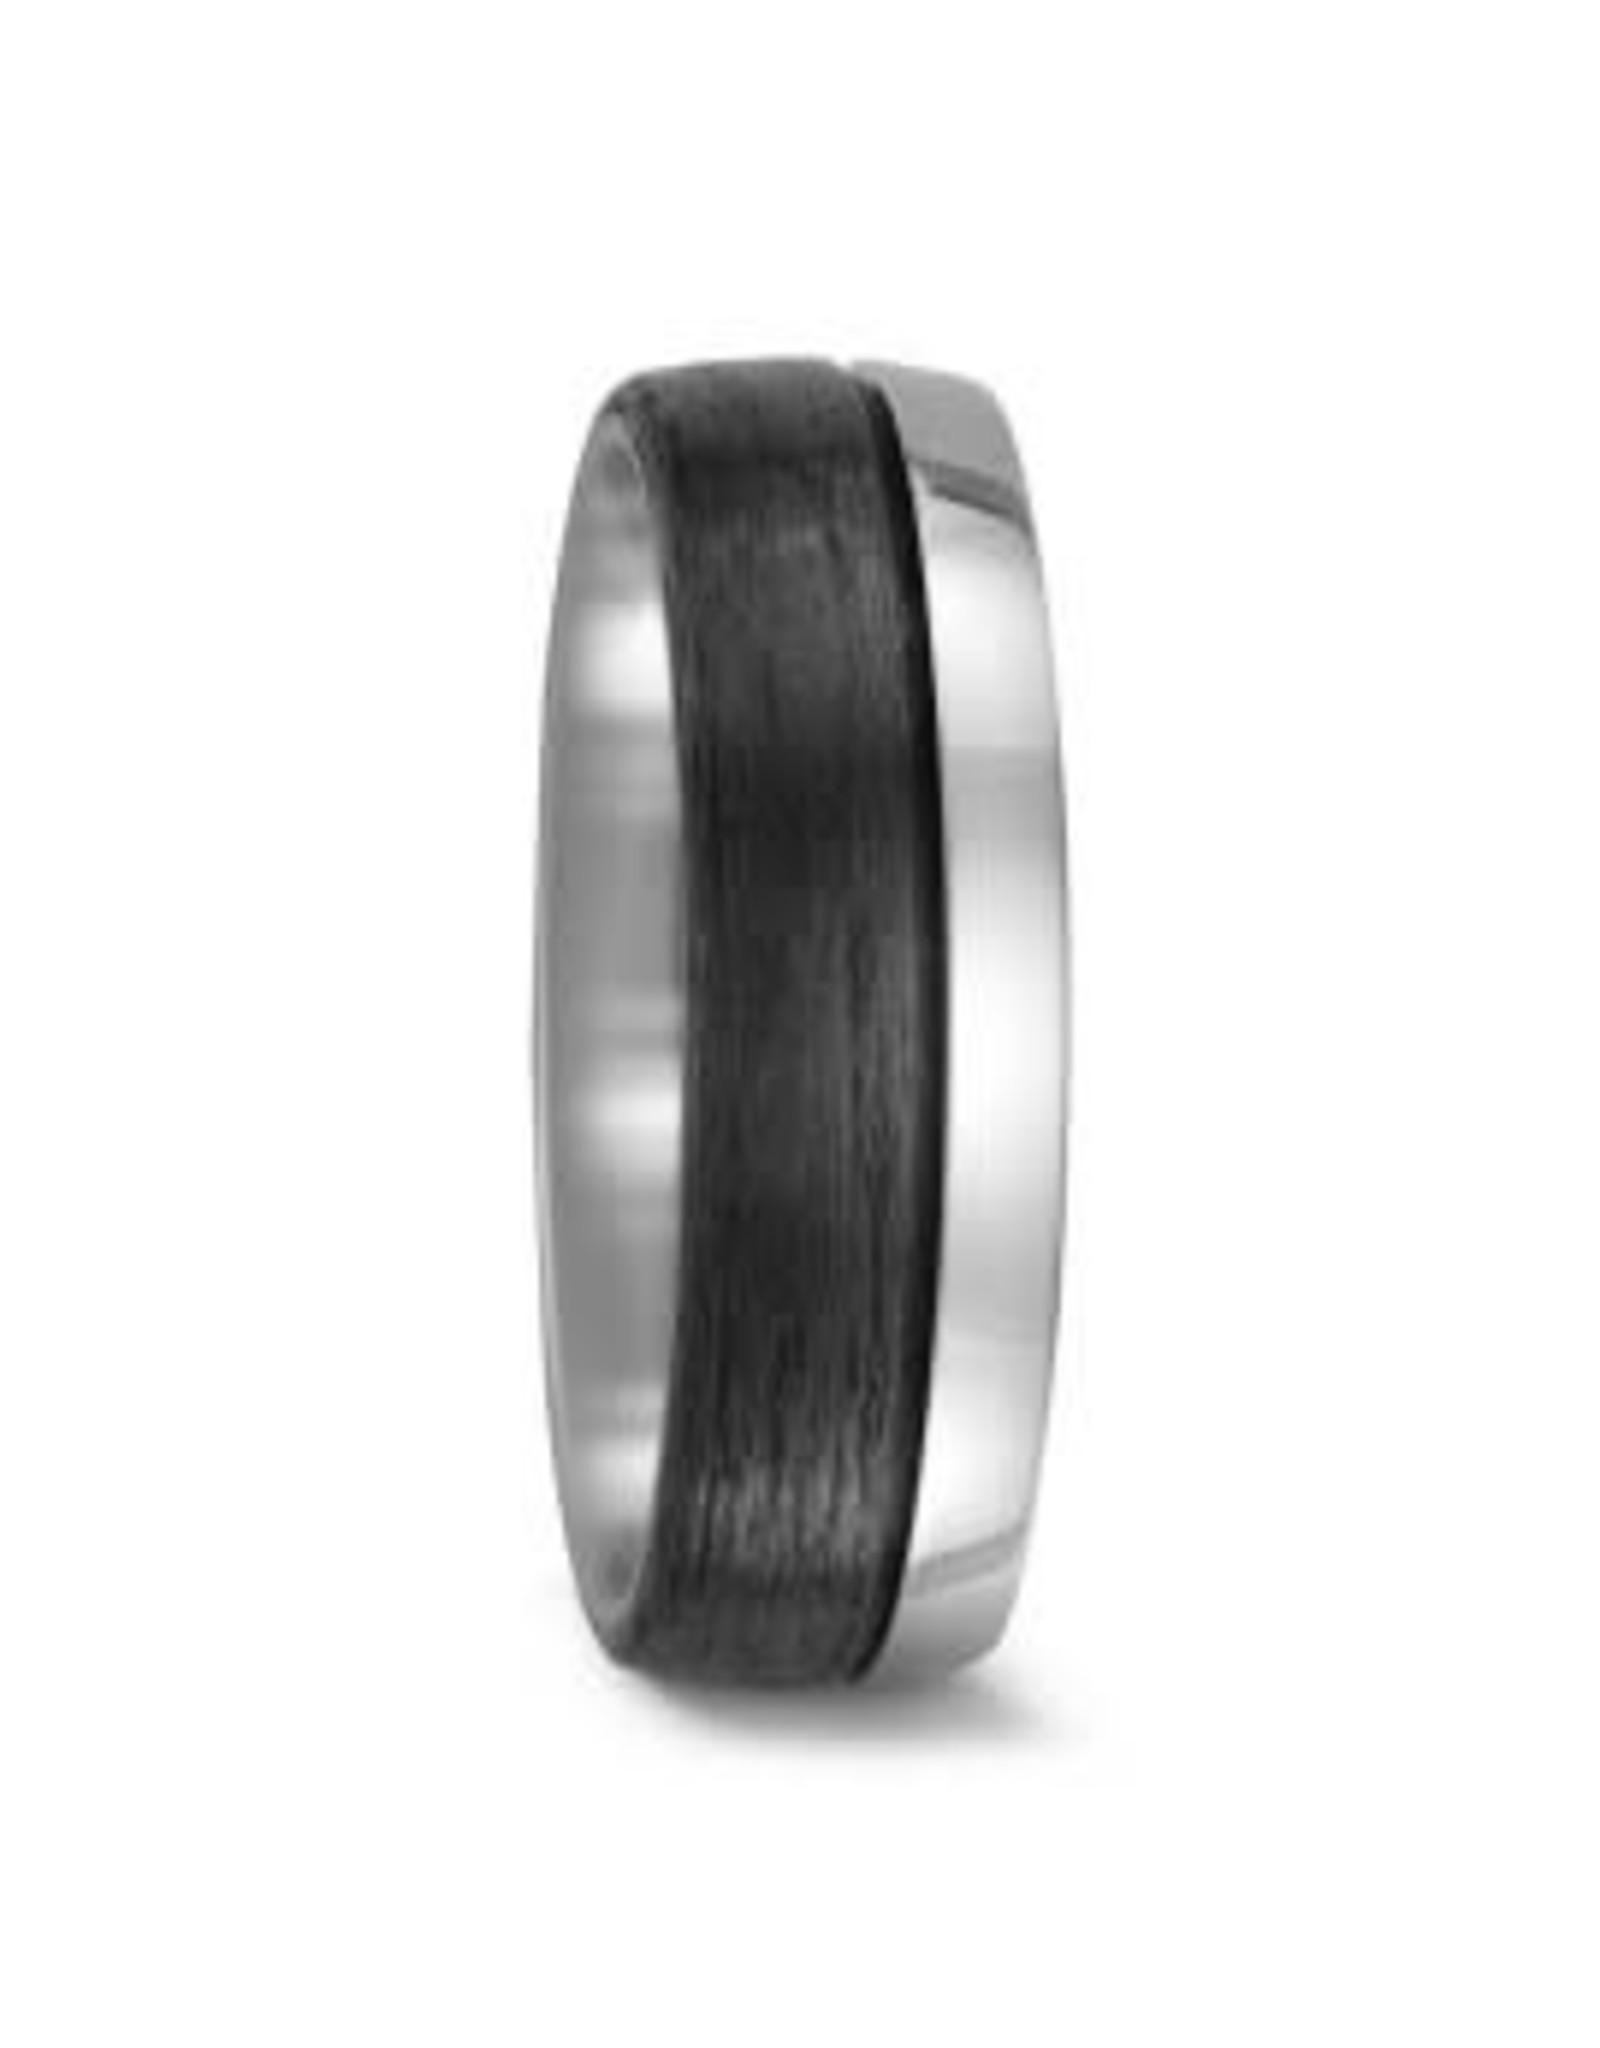 Titan Factory Ring Titan Factory Titanium TF/52477/000/000/20 - 7 mm maat 62